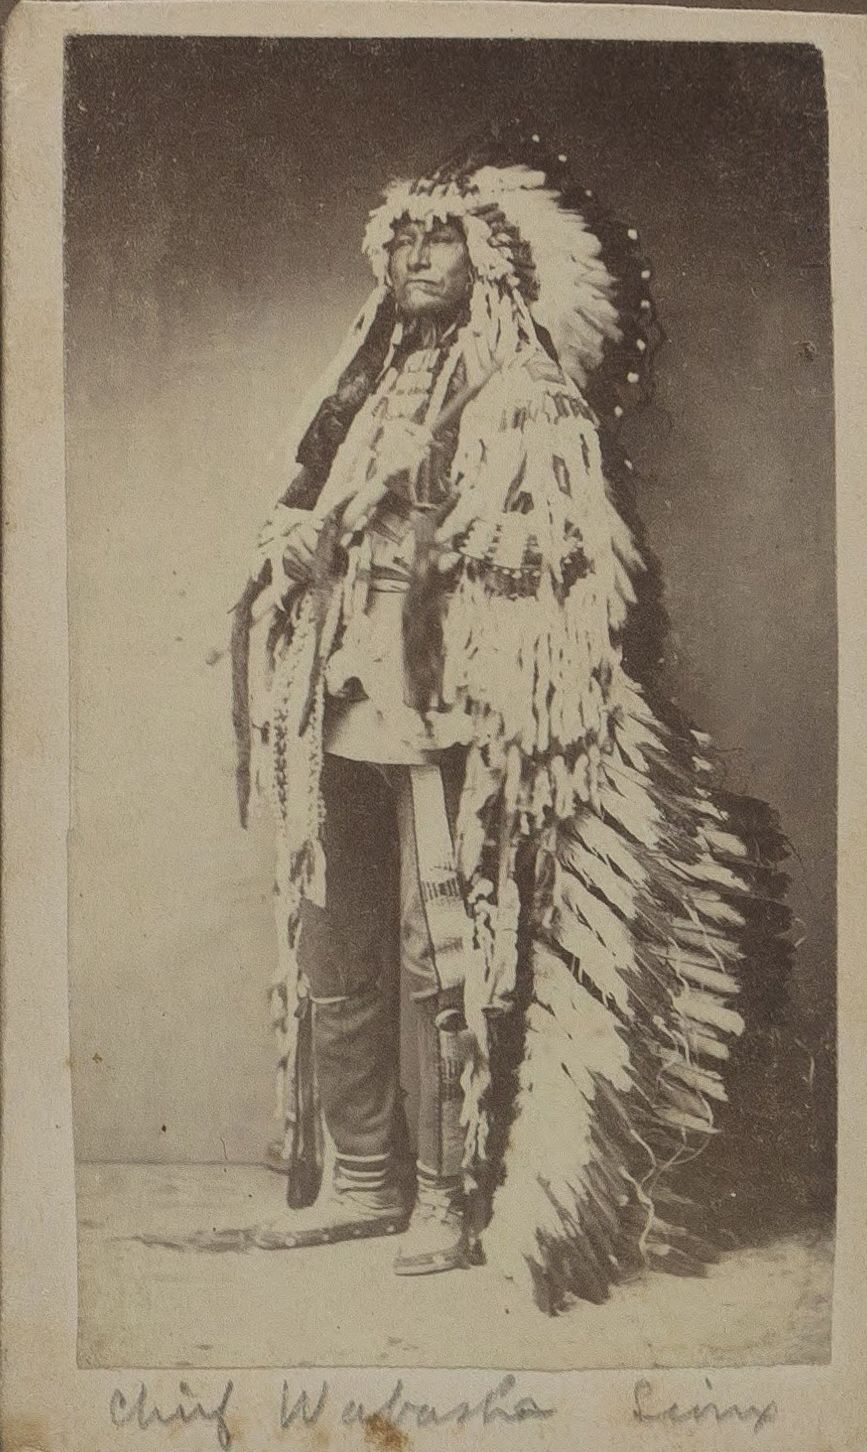 http://www.american-tribes.com/messageboards/dietmar/whitebull9.jpg